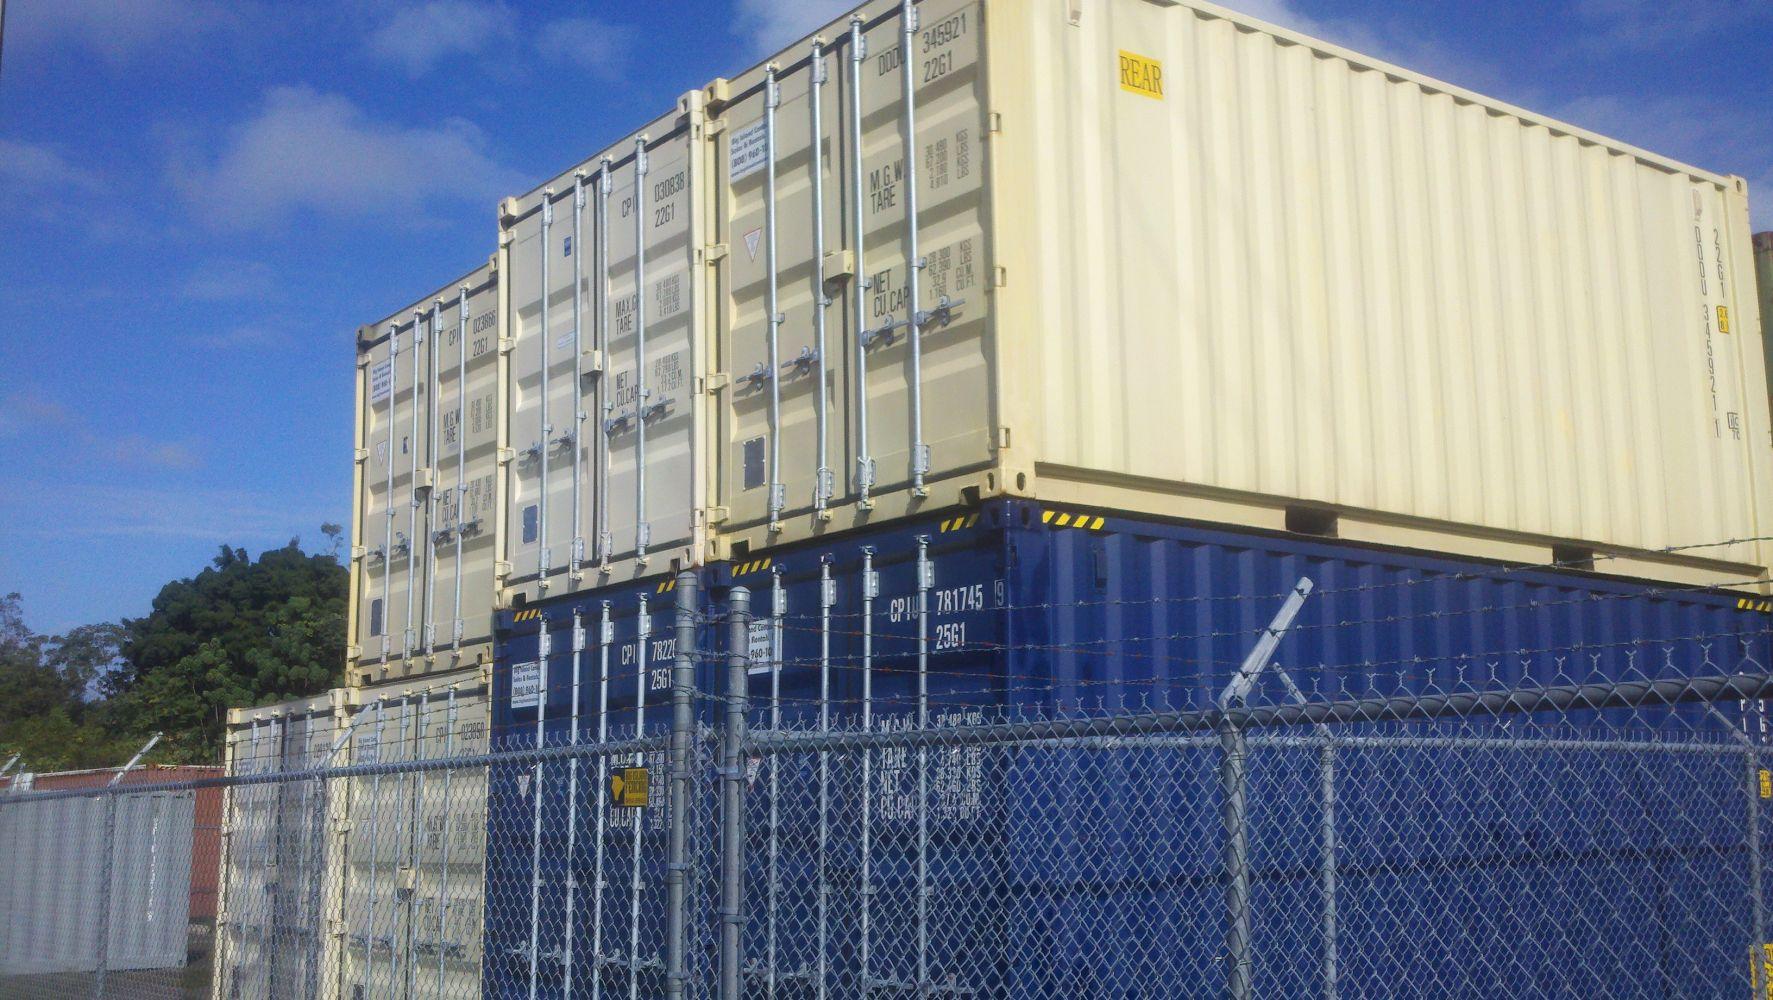 20' Containers on Big Island, Hawaii